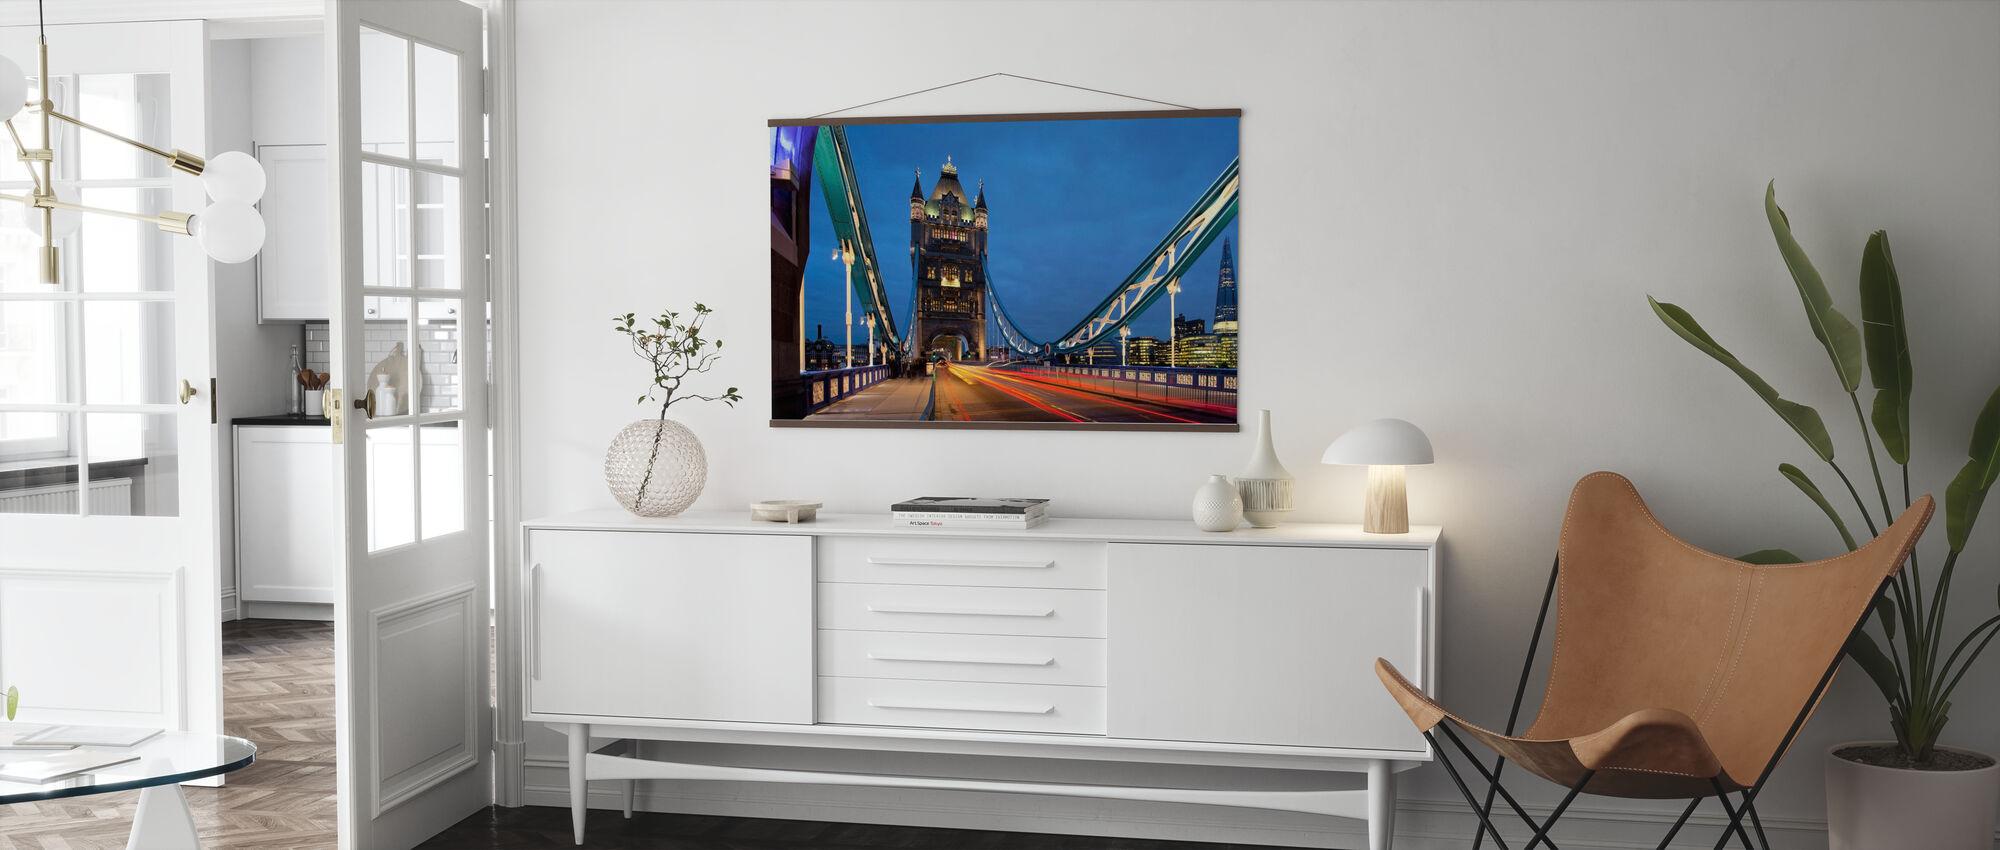 Walk over River Thames - Poster - Living Room